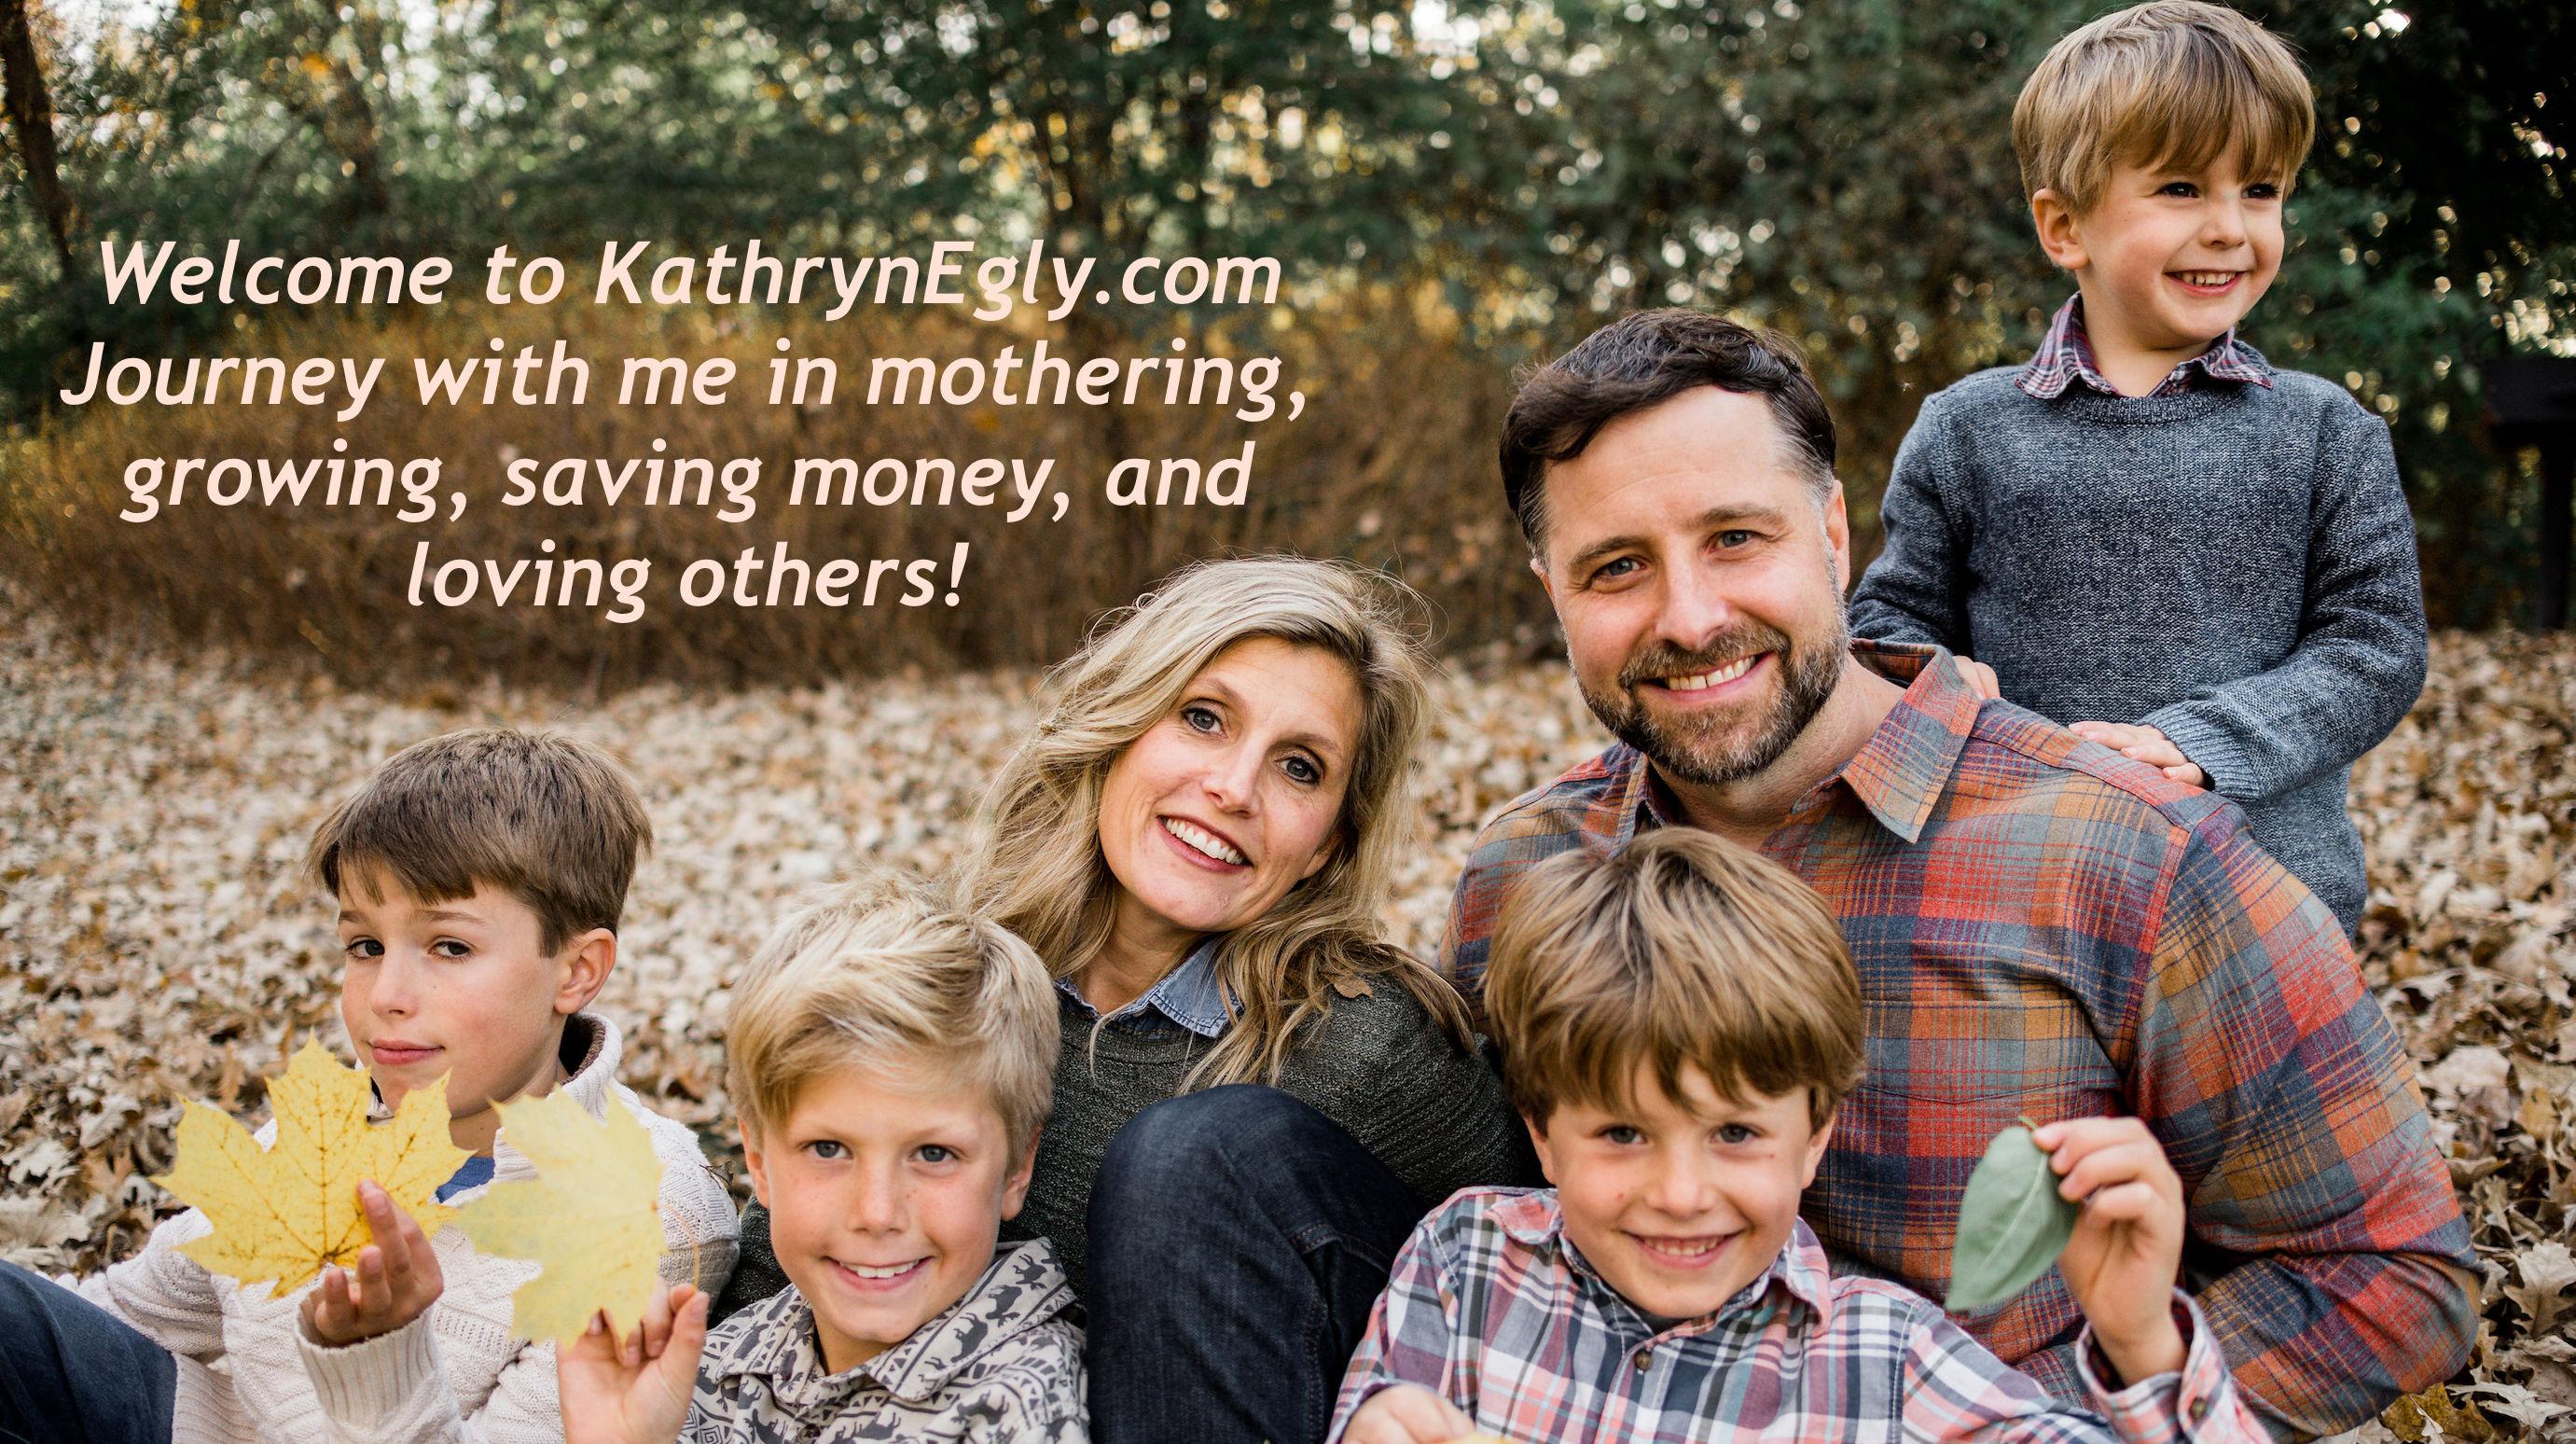 kathrynegly.com